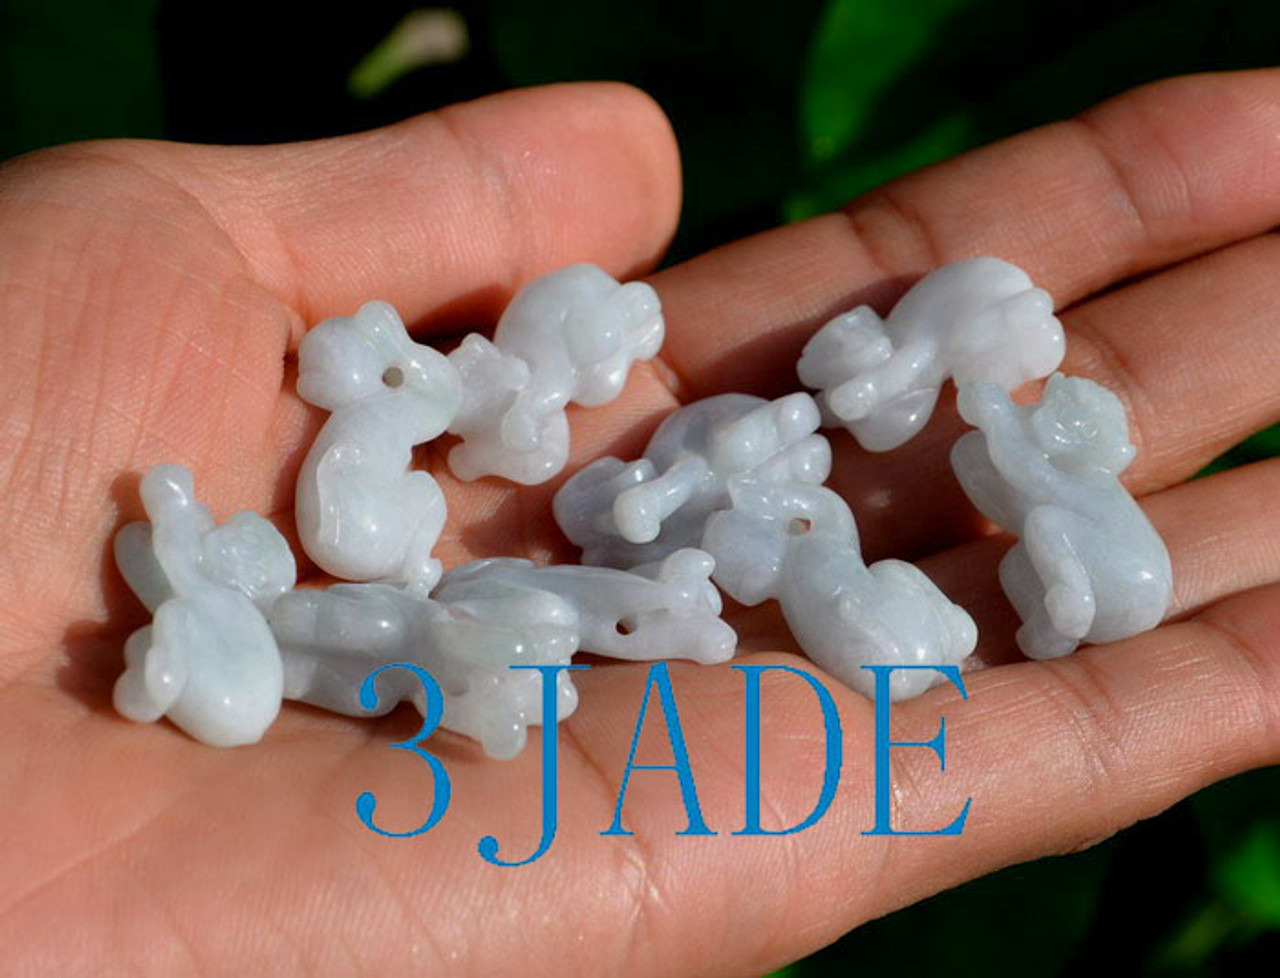 jade money figurine